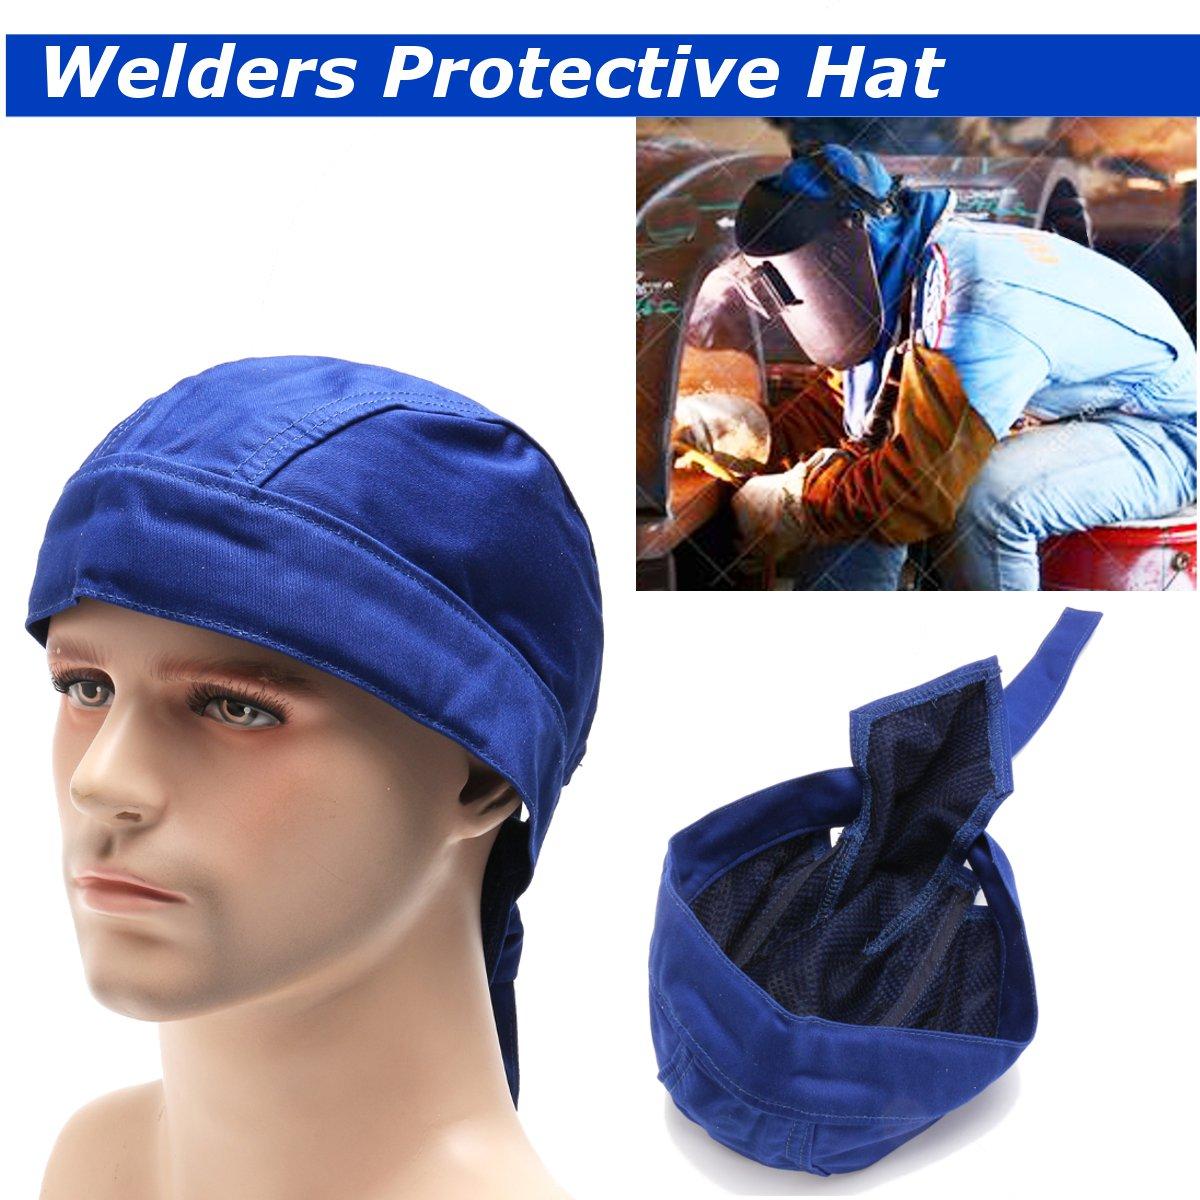 Welding Cap Welders Protective Hat Welding Helmet Cotton Cover Cap Scarf Wear Flame Retardant Fashion  Adjustable Bandana Type